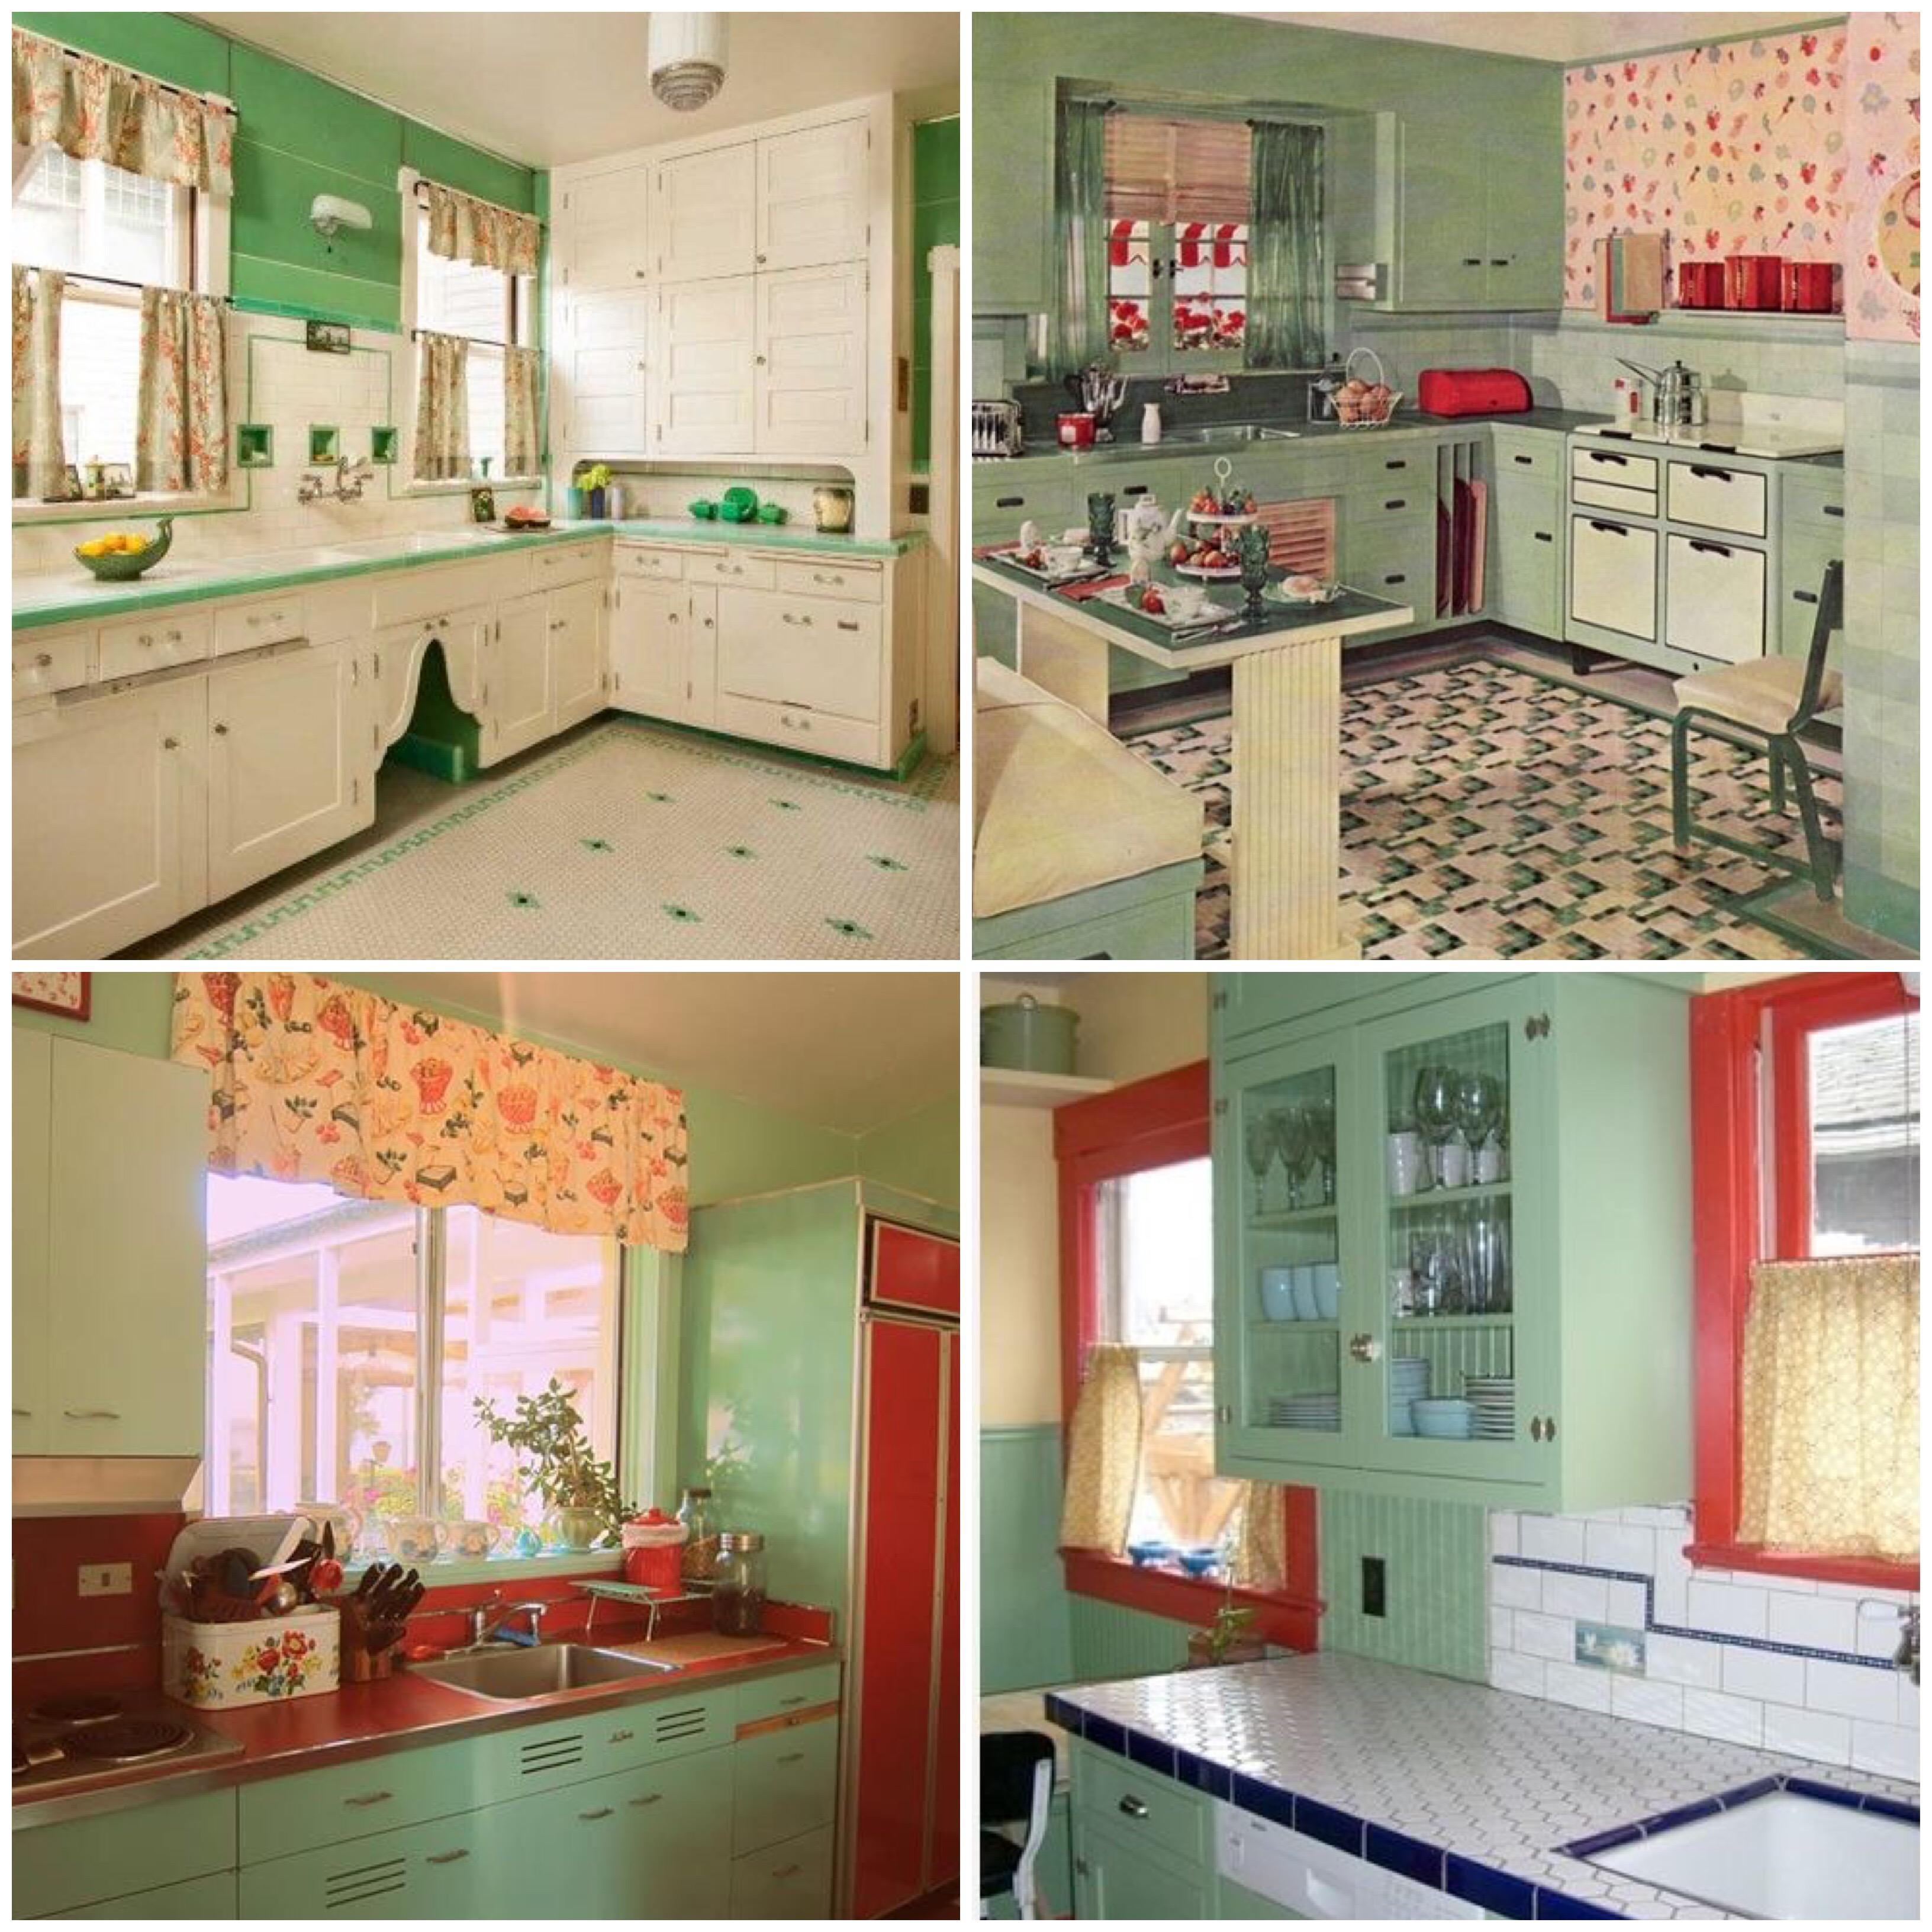 Taste the Rainbow Vintage Kitchens of Every Shade